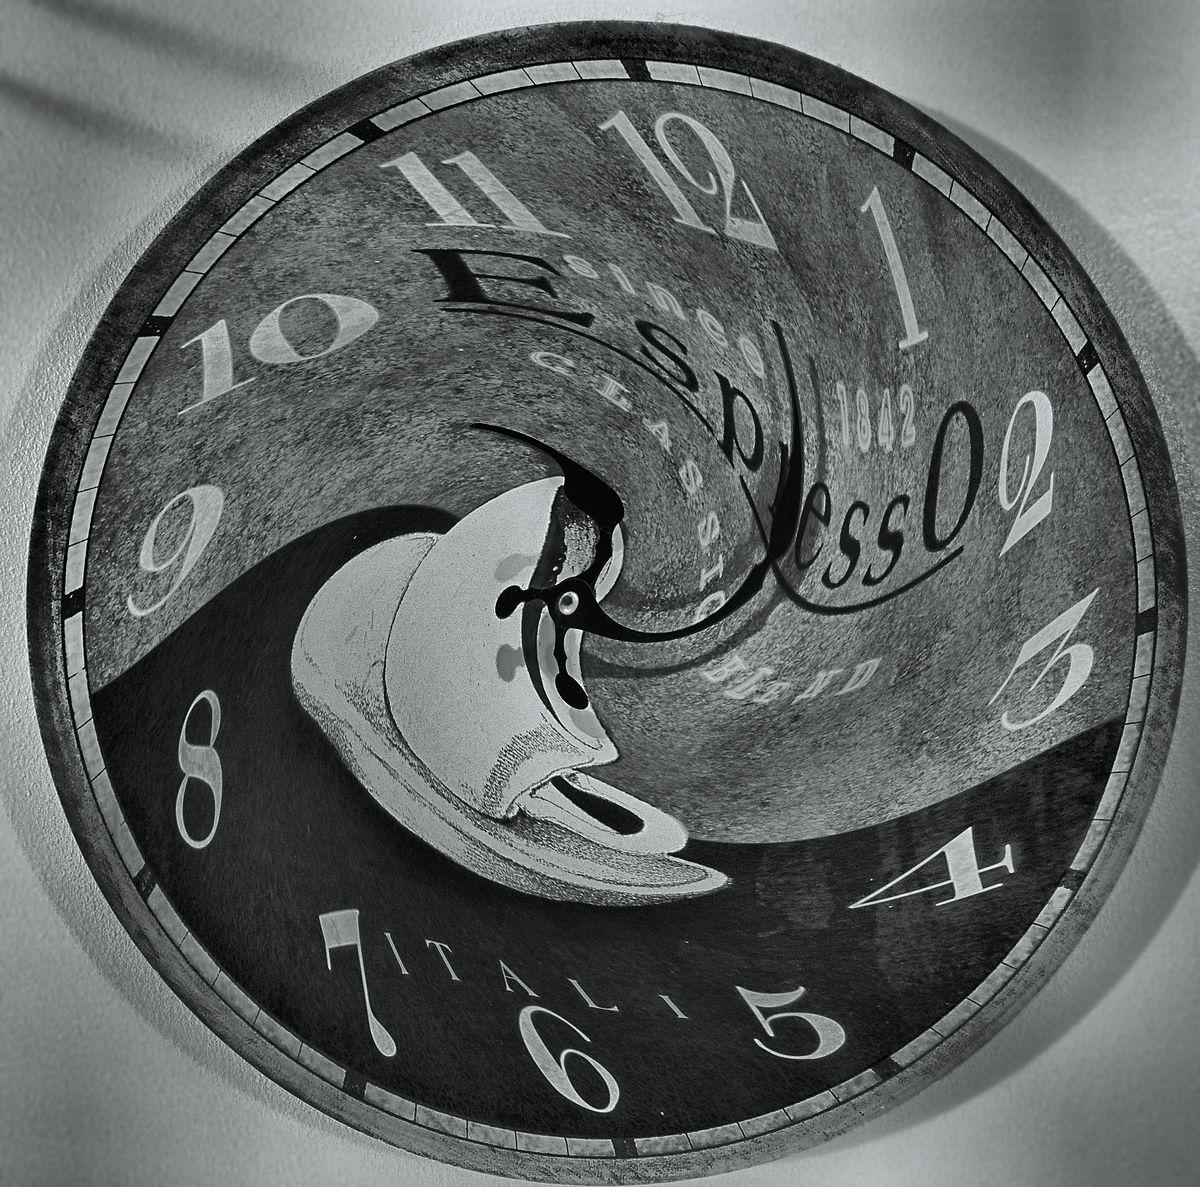 Abstract Eyes Futuristic Steampunk Clocks Gears Lens